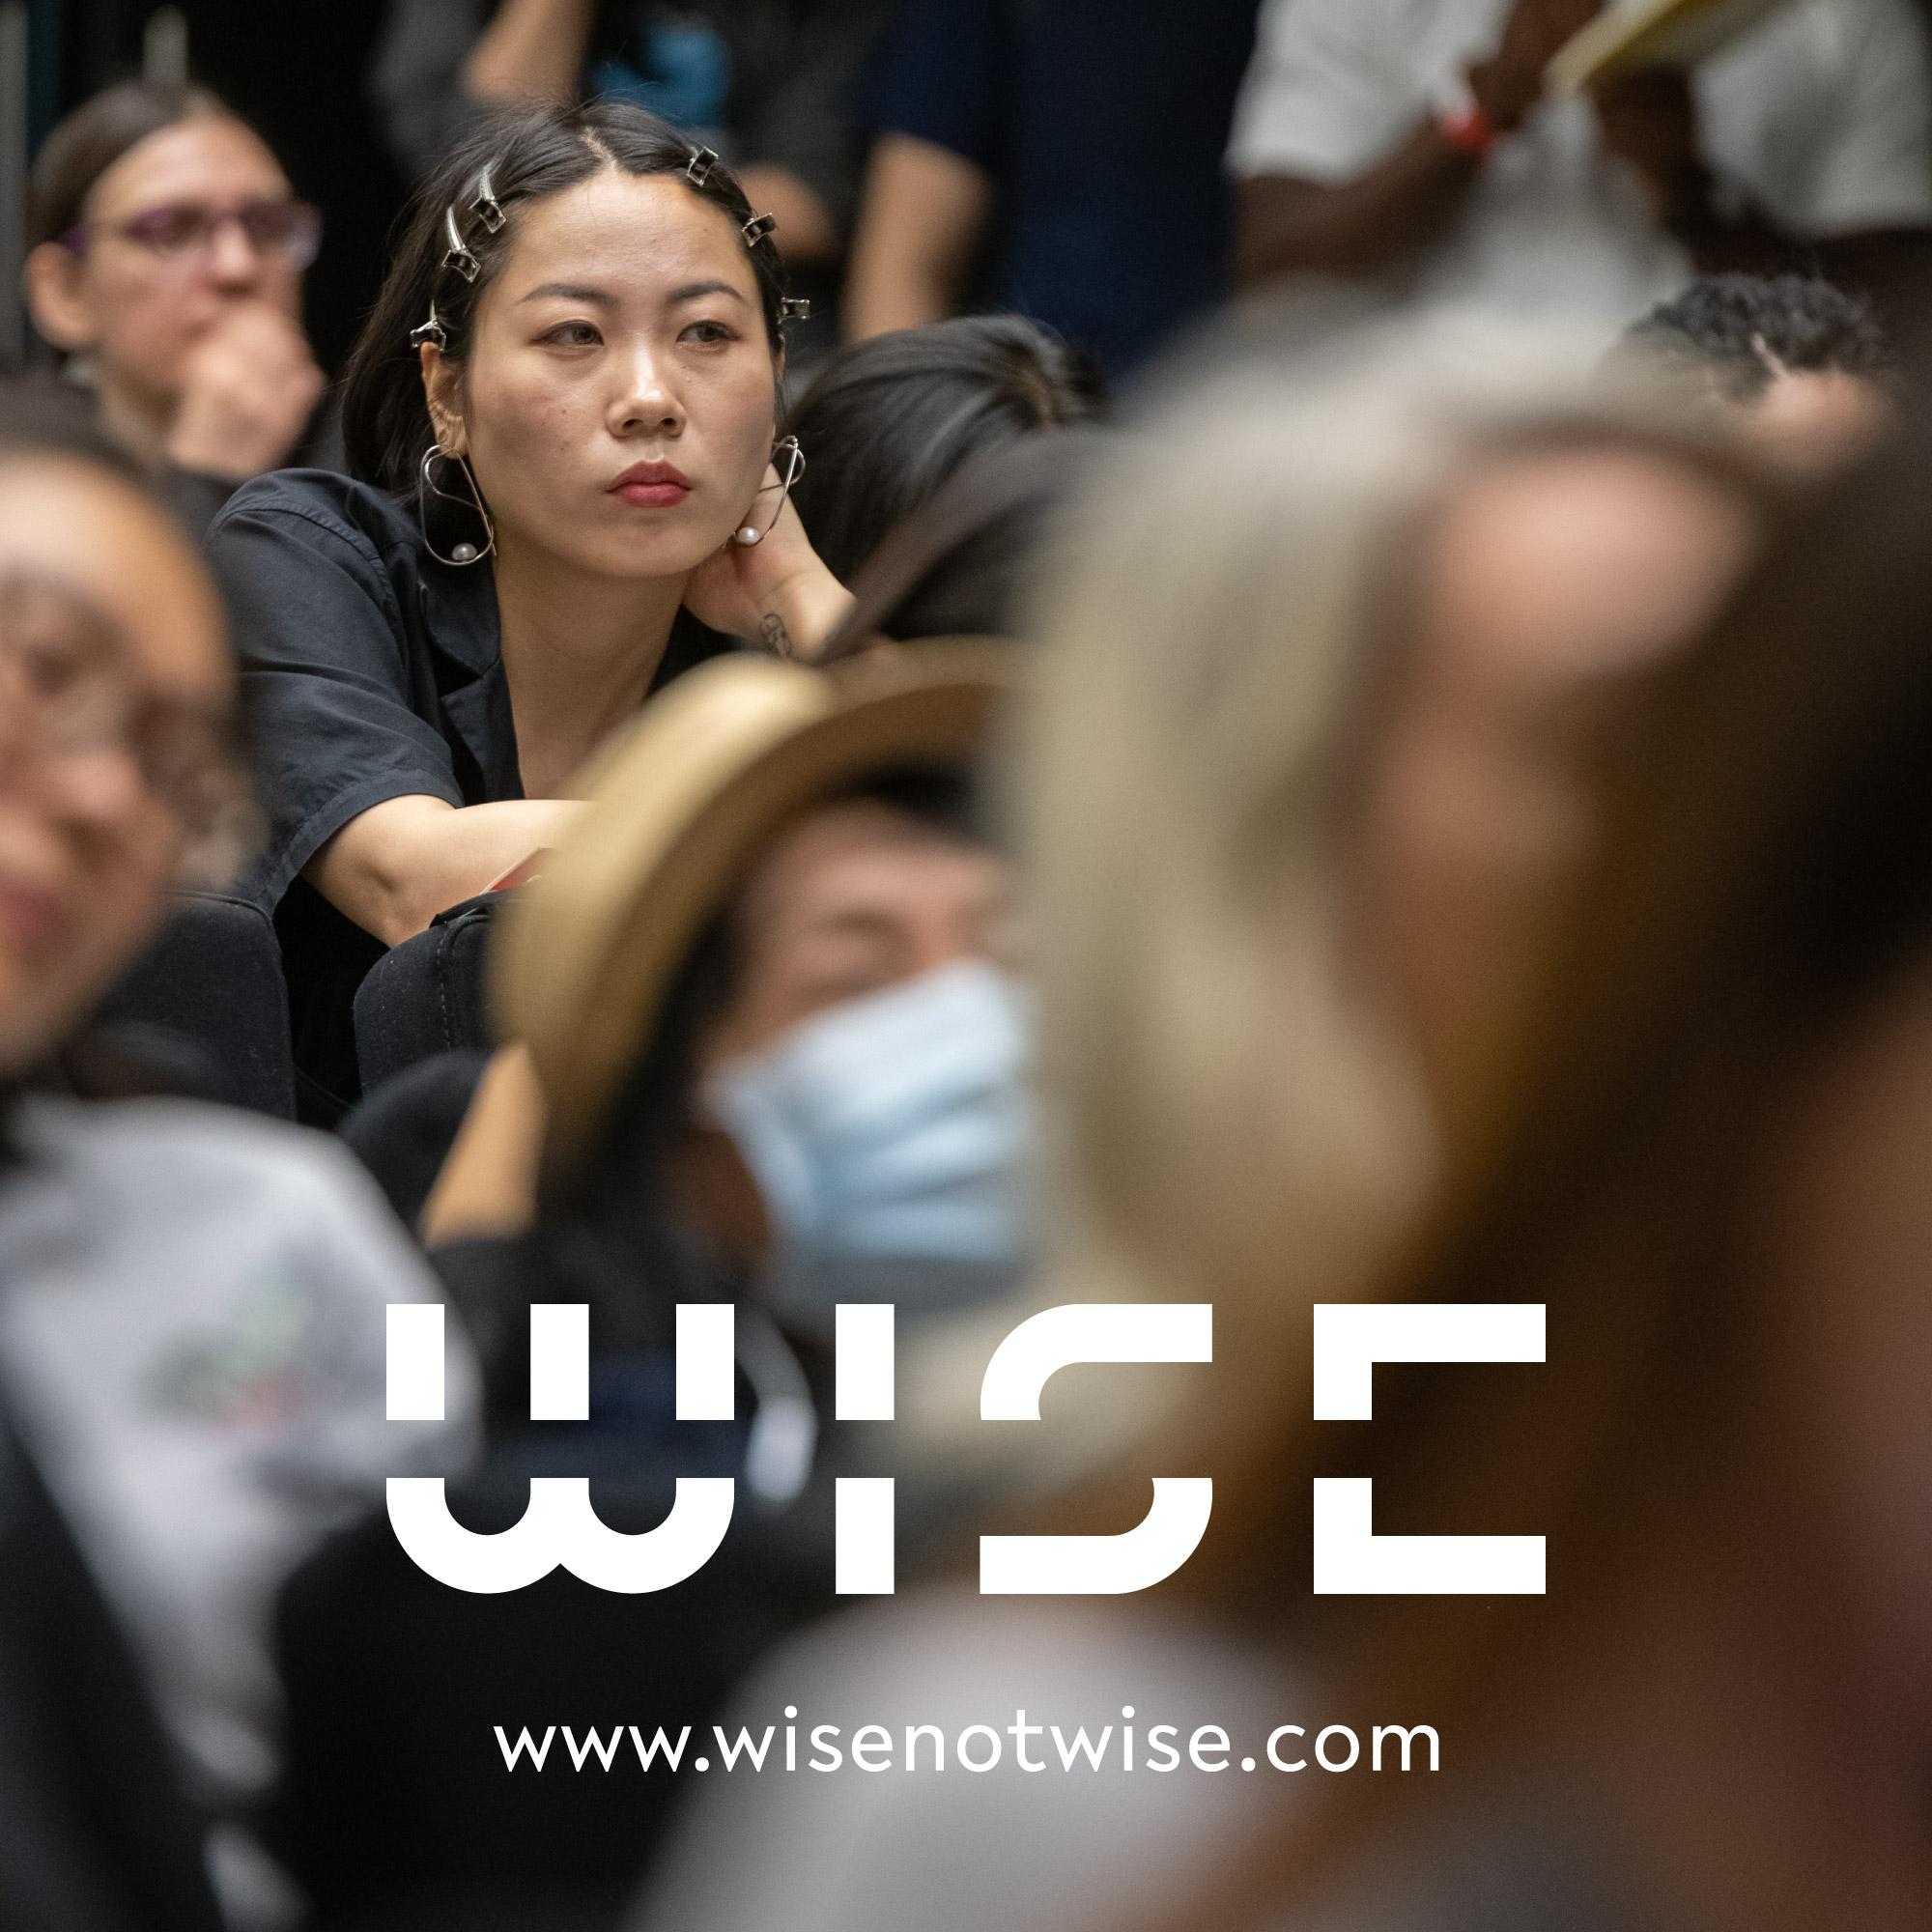 WISE_RECAP_2019_DAY_1_47.jpg